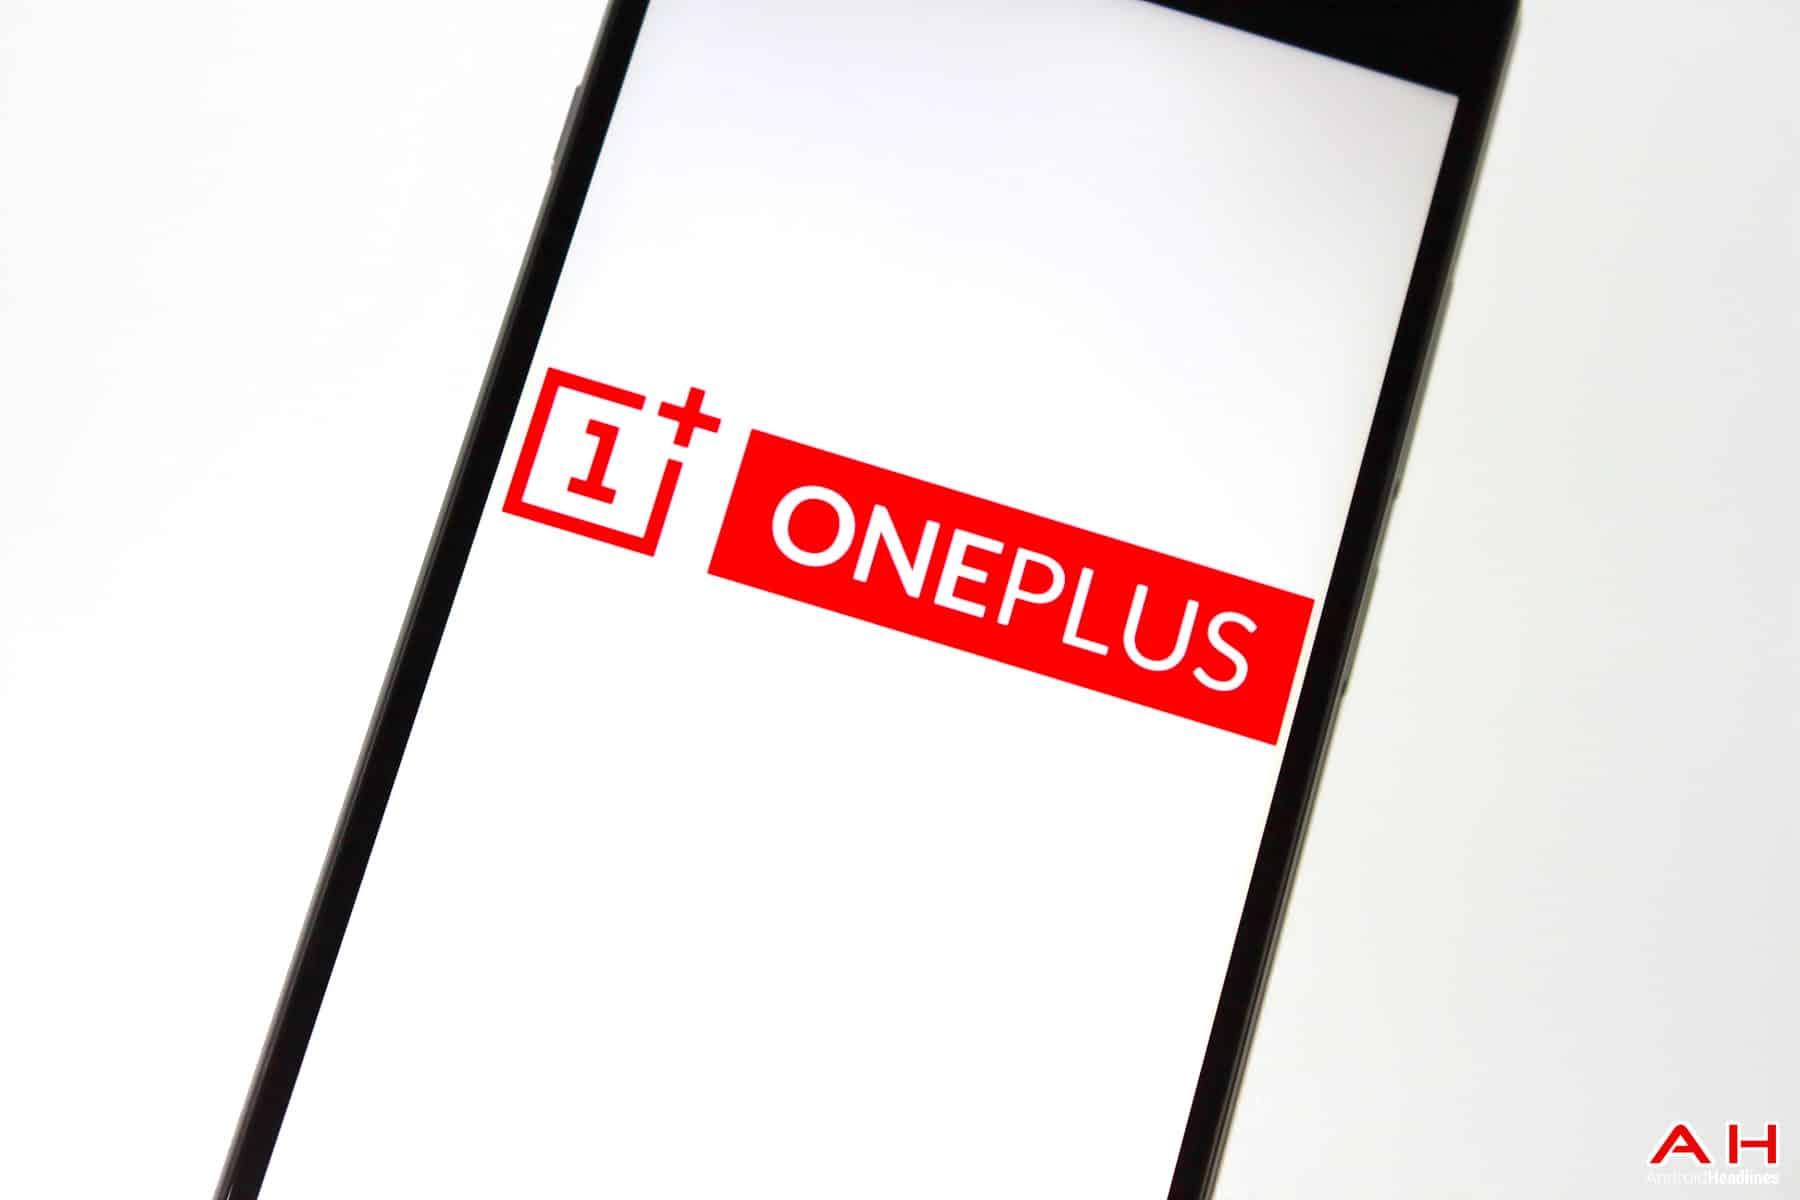 AH Oneplus 2 One Plus Two OP OPT Logo - Chris 2015 -21